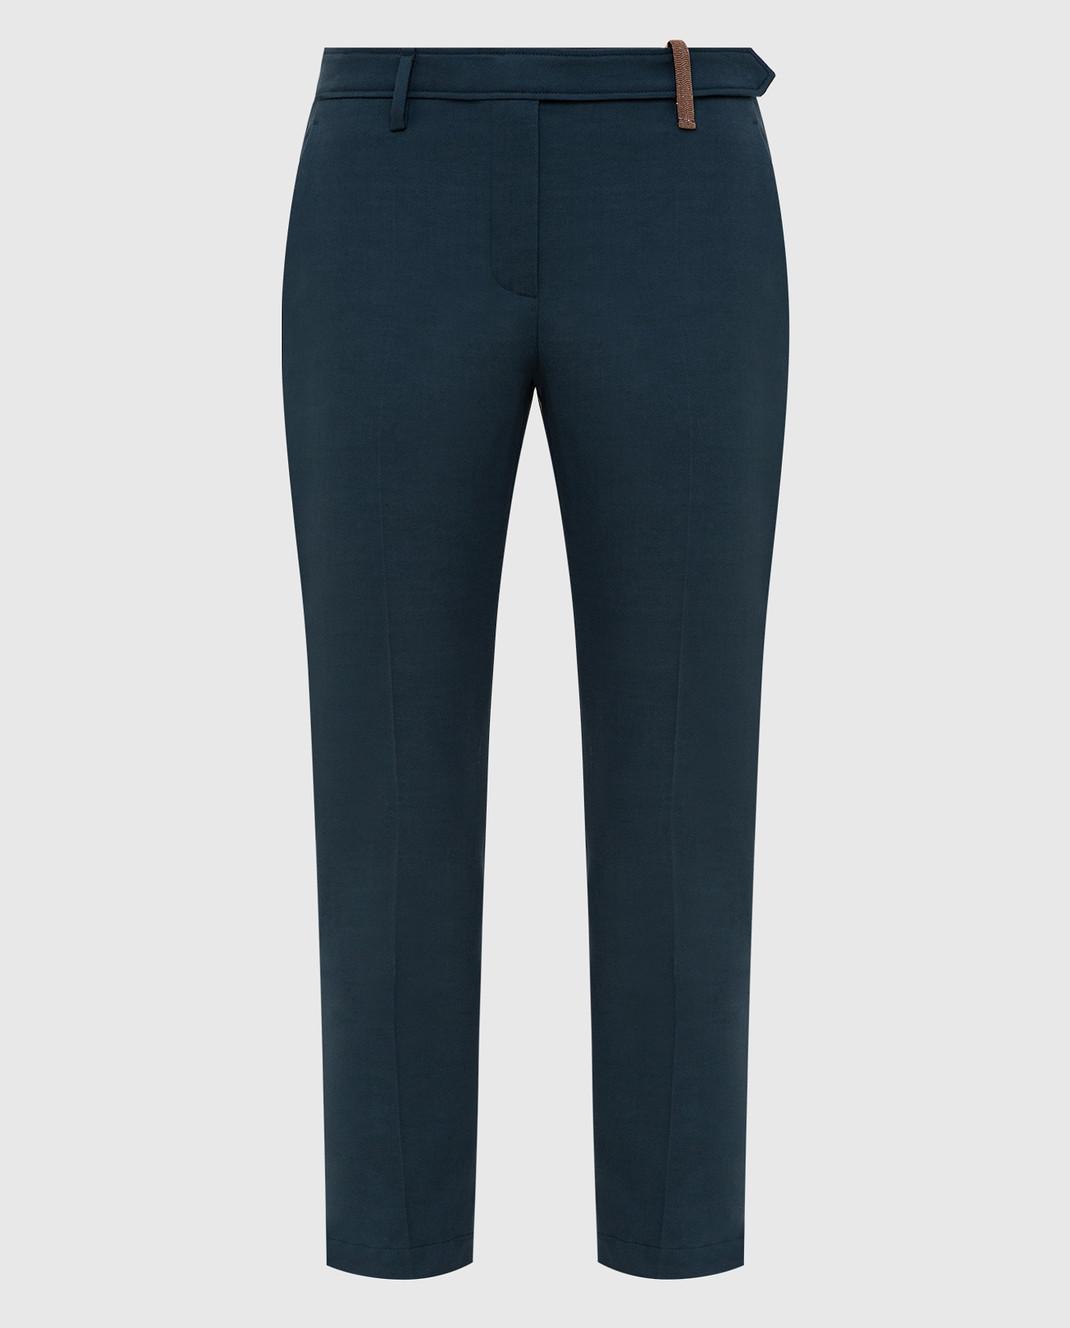 Brunello Cucinelli Темно-бирюзовые брюки изображение 1